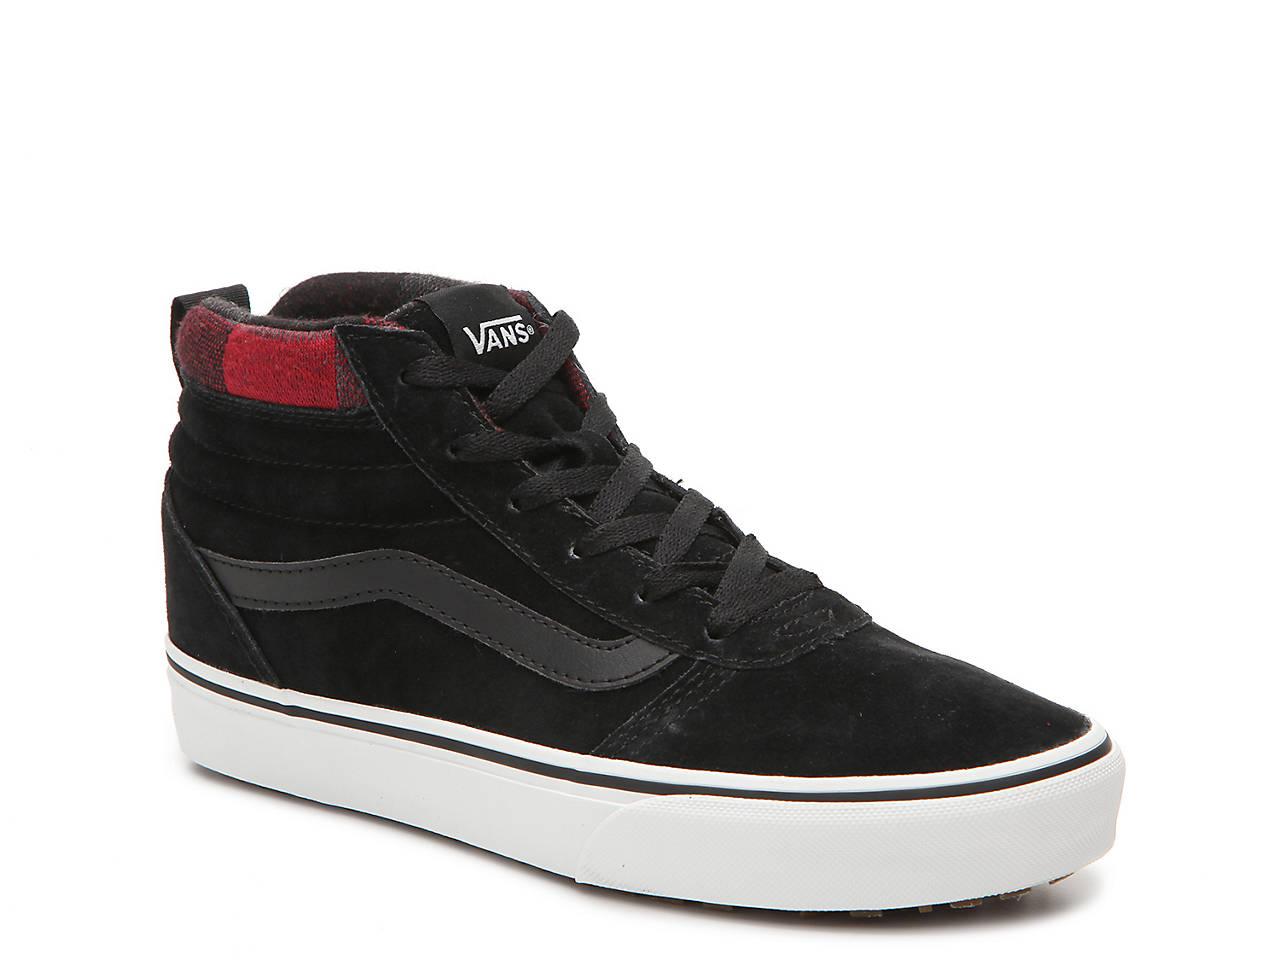 13bf18a002fd80 Vans Ward Hi MTE High-Top Sneaker - Women s Women s Shoes